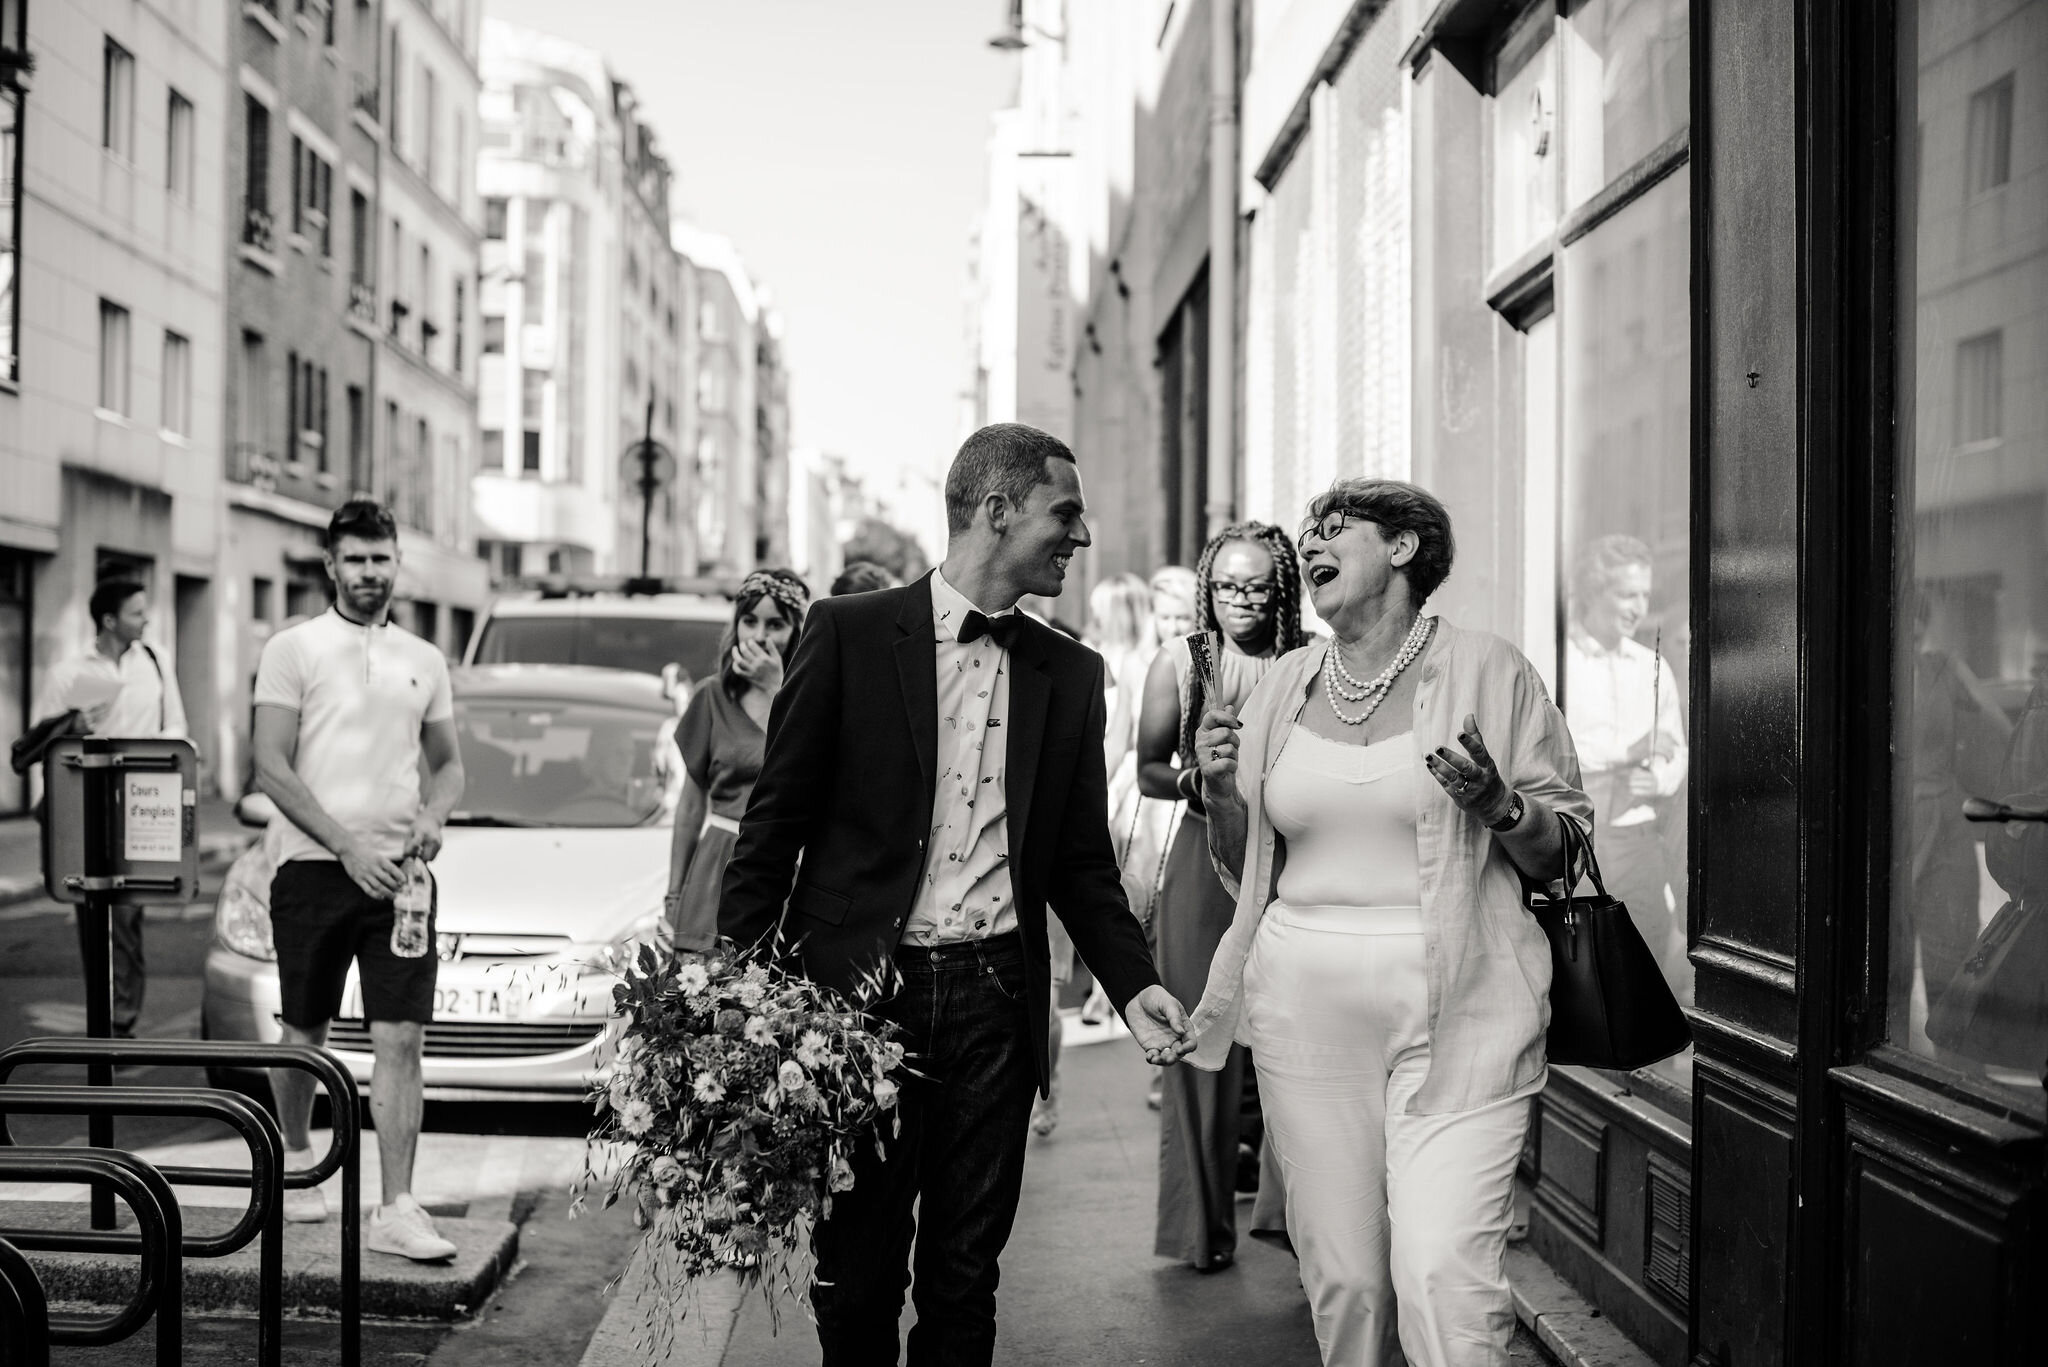 Léa-Fery-Photographe-Bretagne-Mariage-Famille-2416.jpg